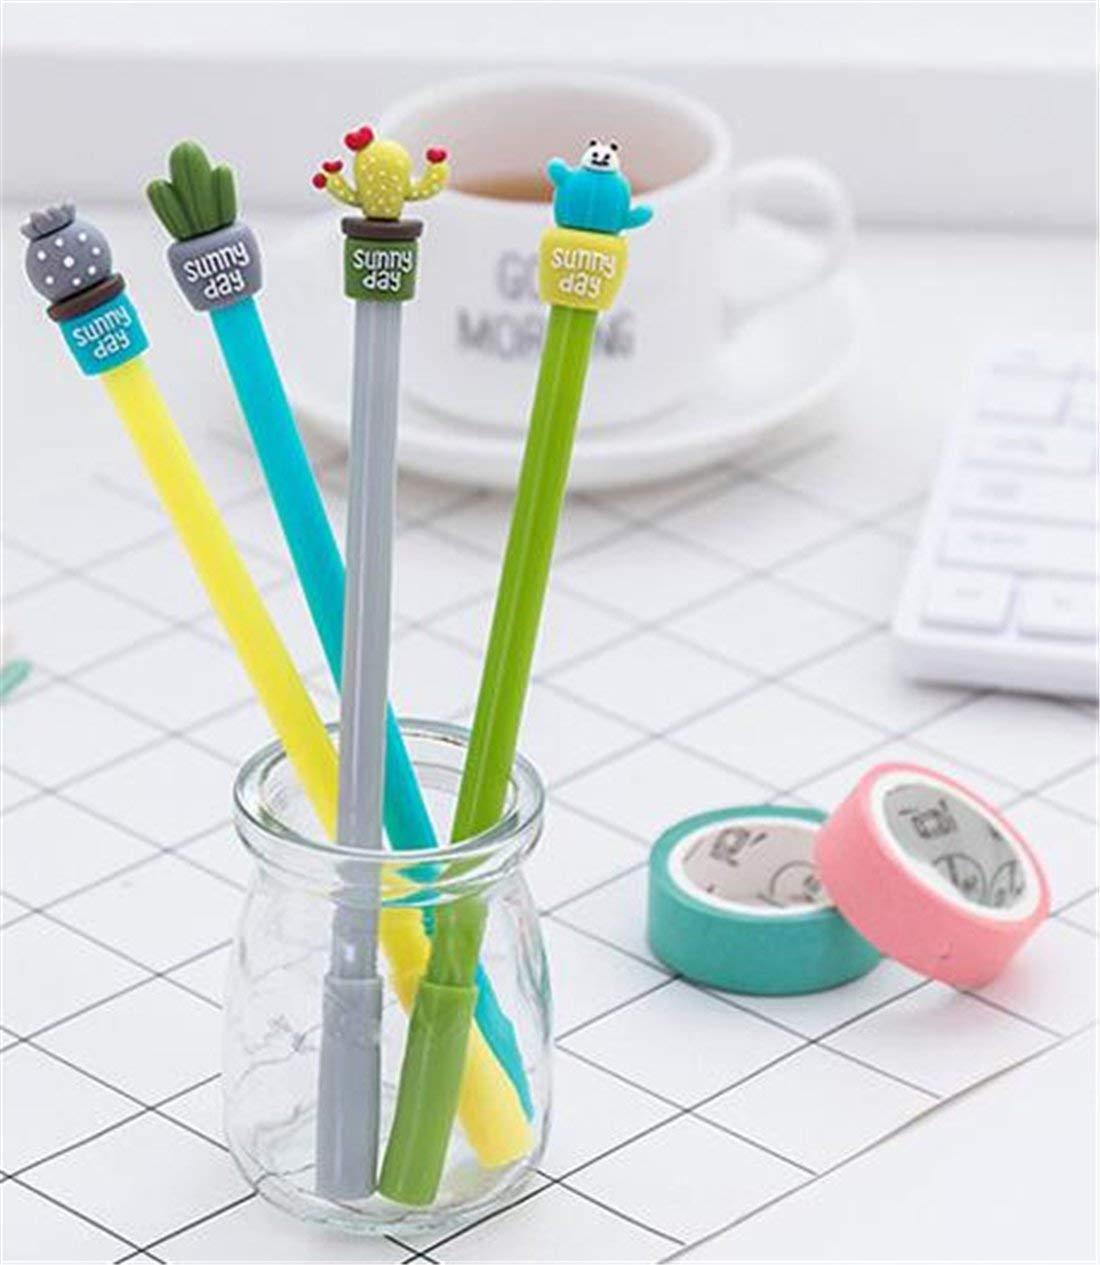 Heyuni.4Pcs/Set Creative Gel Pen,Cute Style Cactus Rollerball Pen for Office School Stationery Supplies